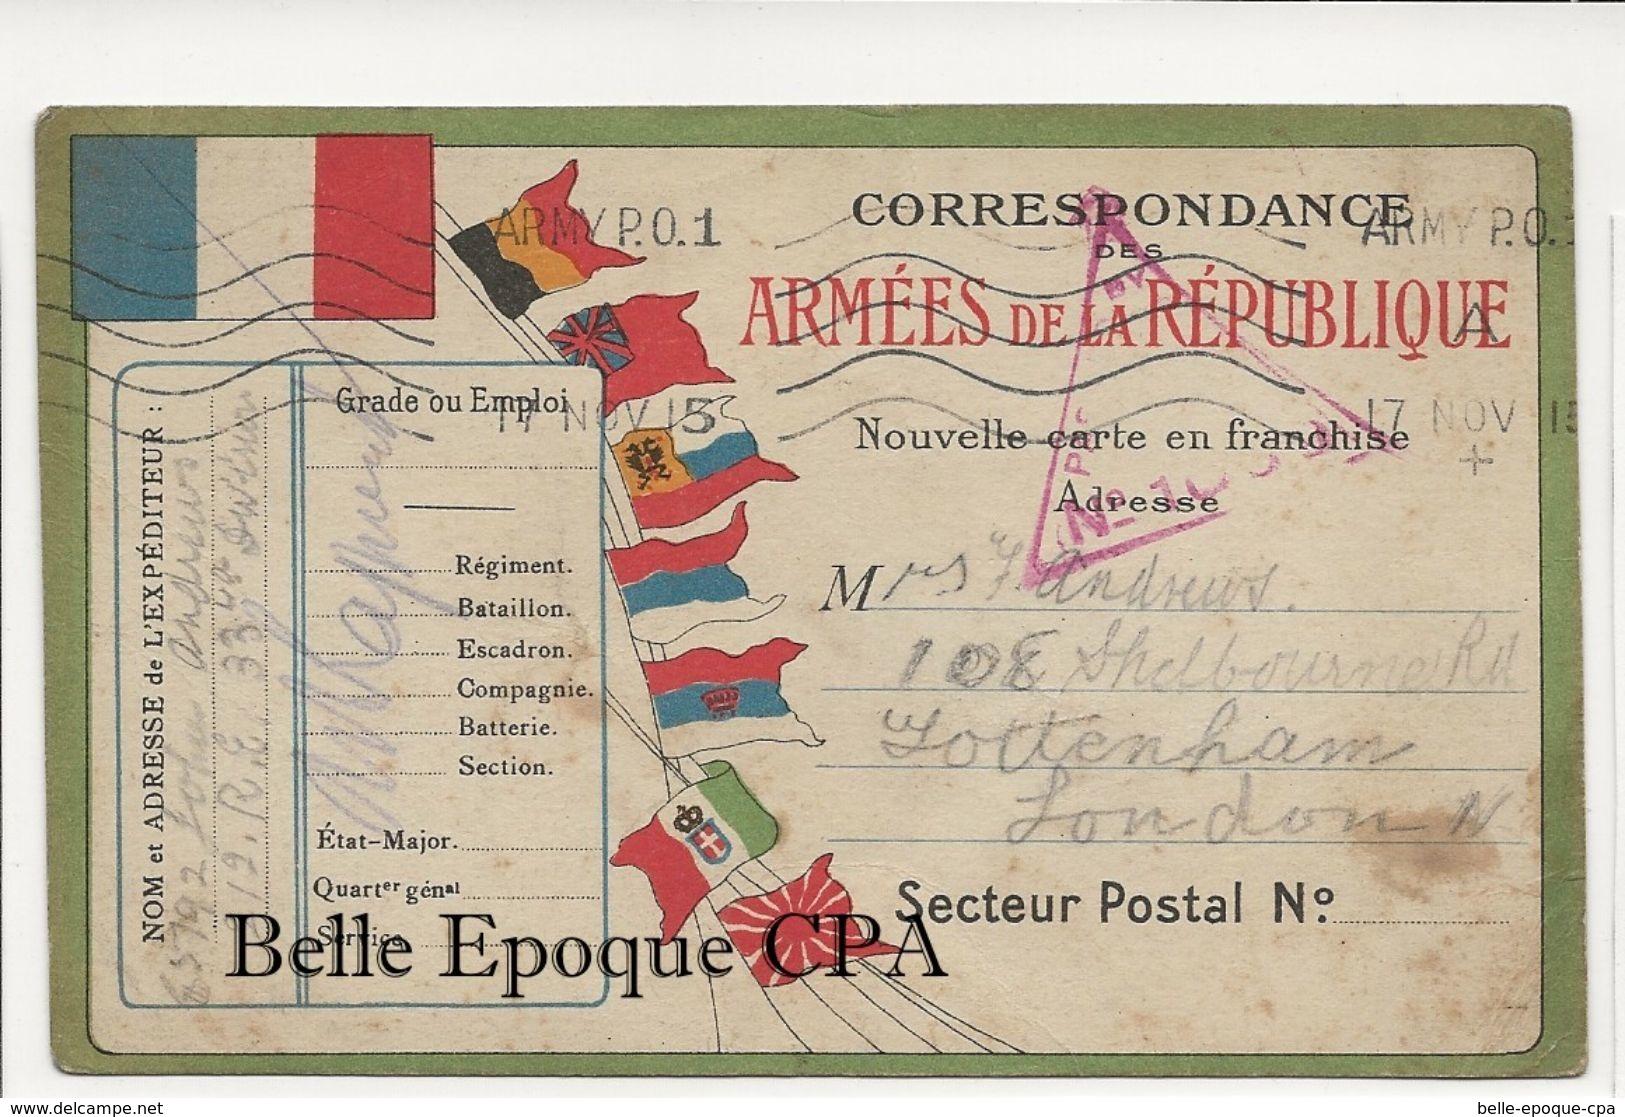 Militaria / Carte-Postale 1915 +++ BRITISH ARMY P. O. ---> Tottenham, London ++++ FM / CENSOR - Marcophilie (Lettres)